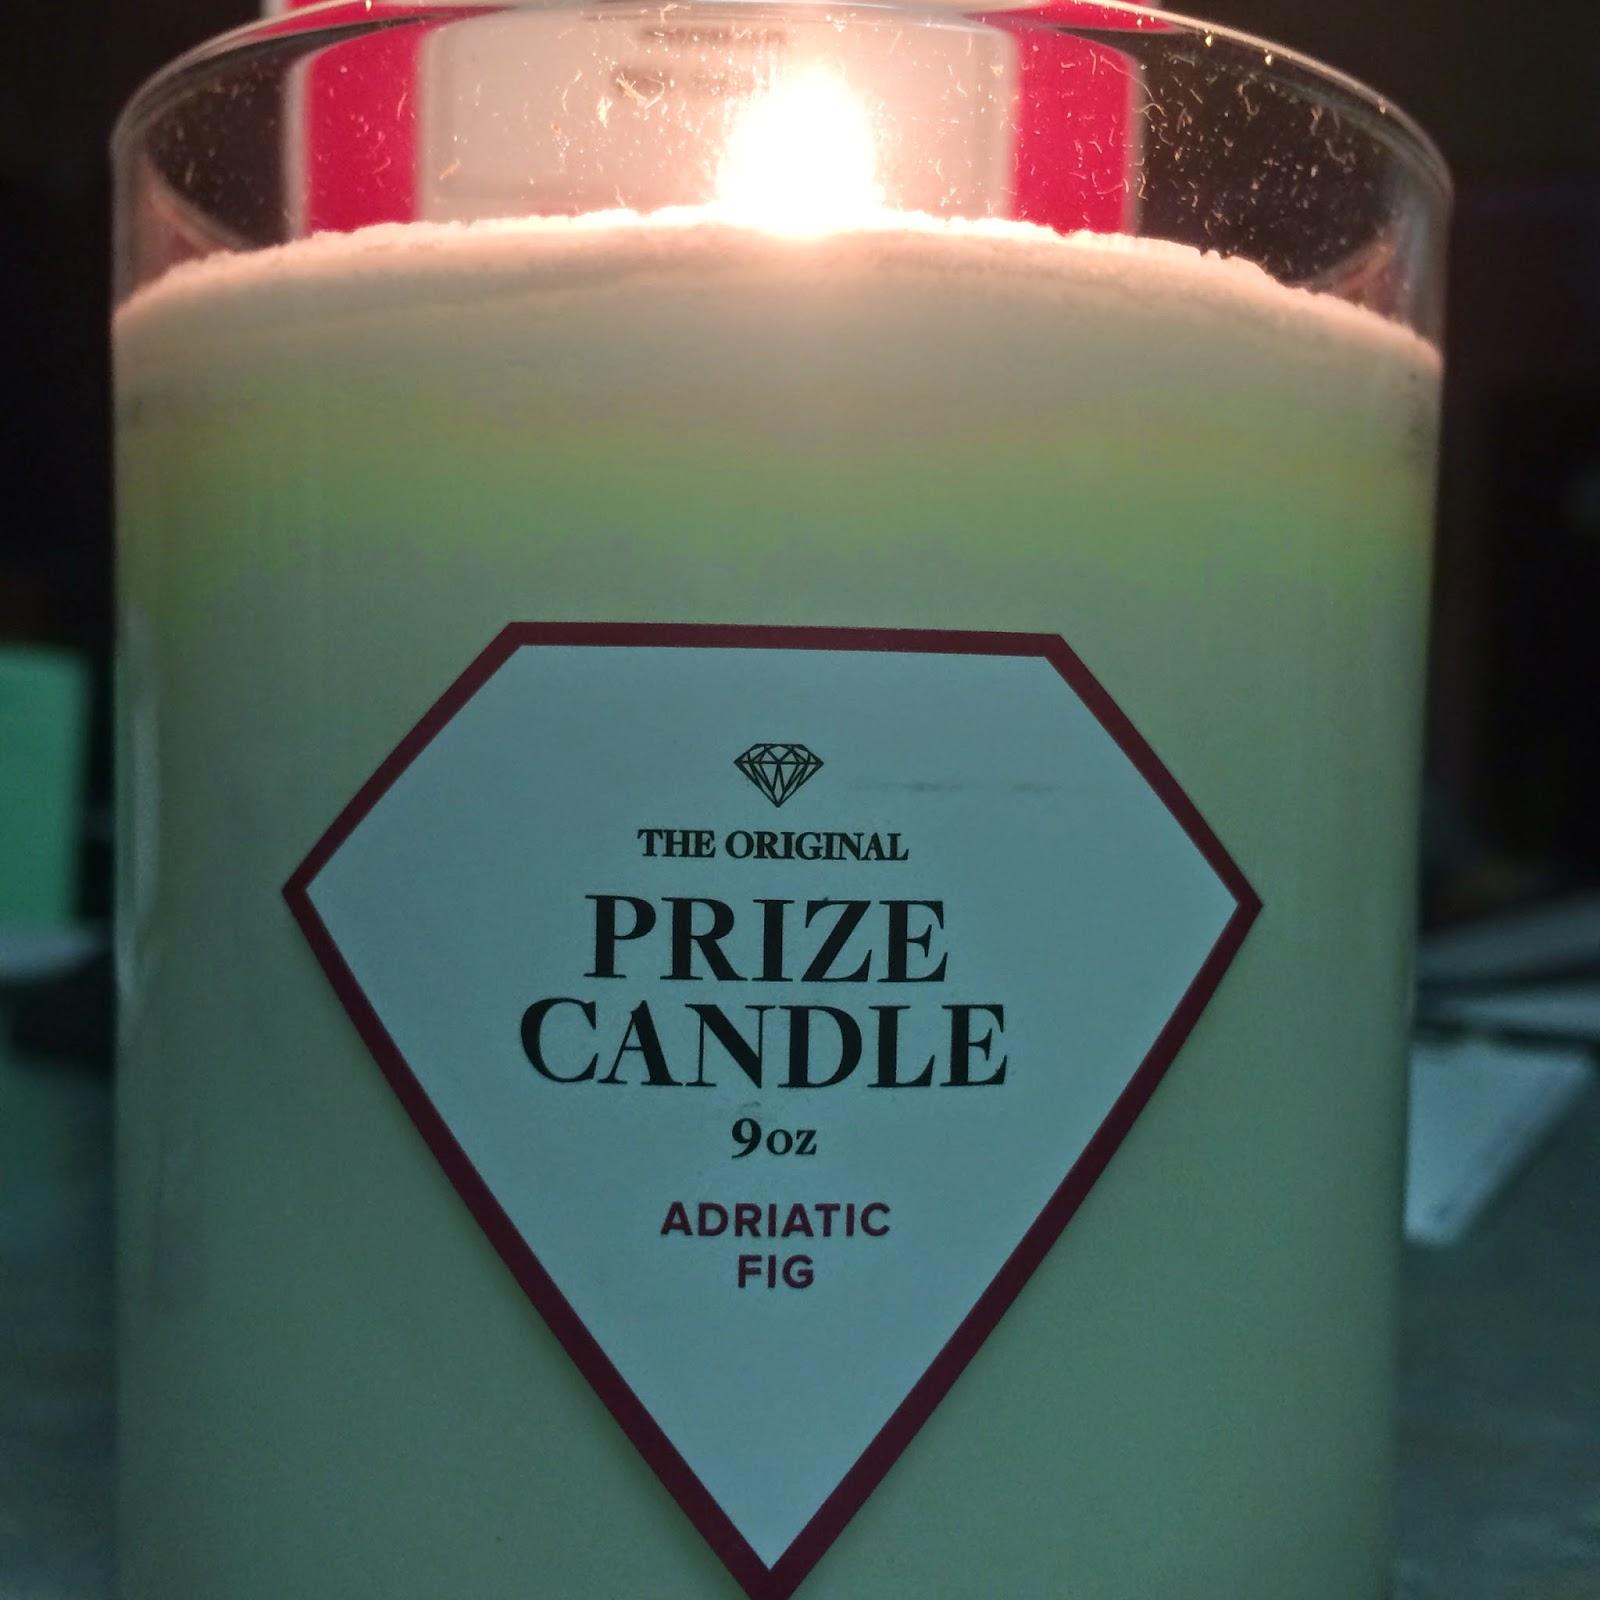 Adriatic Fig #prizecandle burning candle